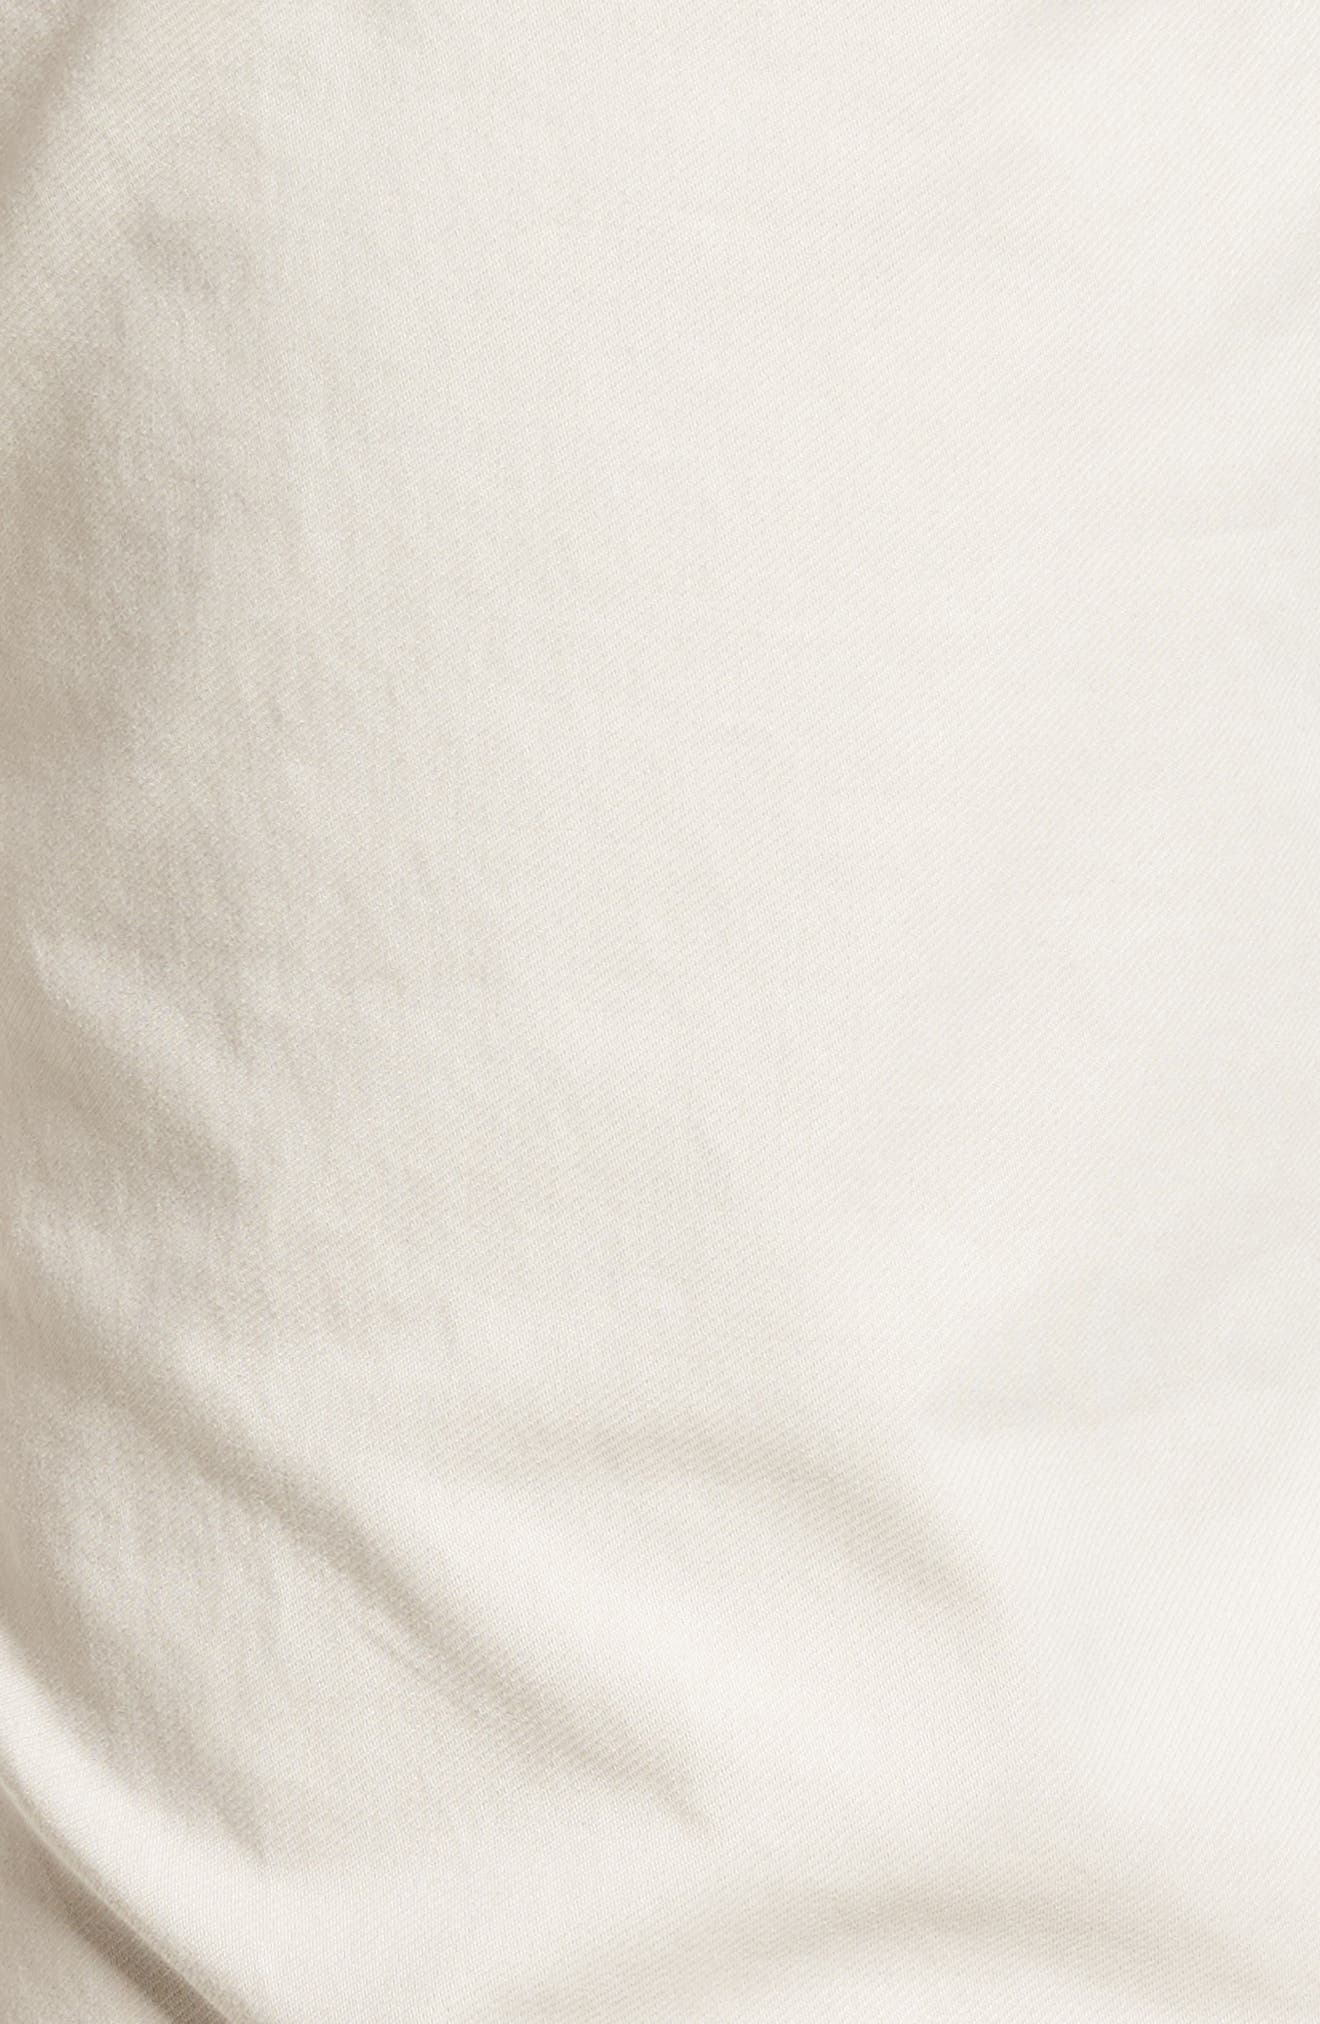 Chuck Flat Front Stretch Cotton Pants,                             Alternate thumbnail 5, color,                             250